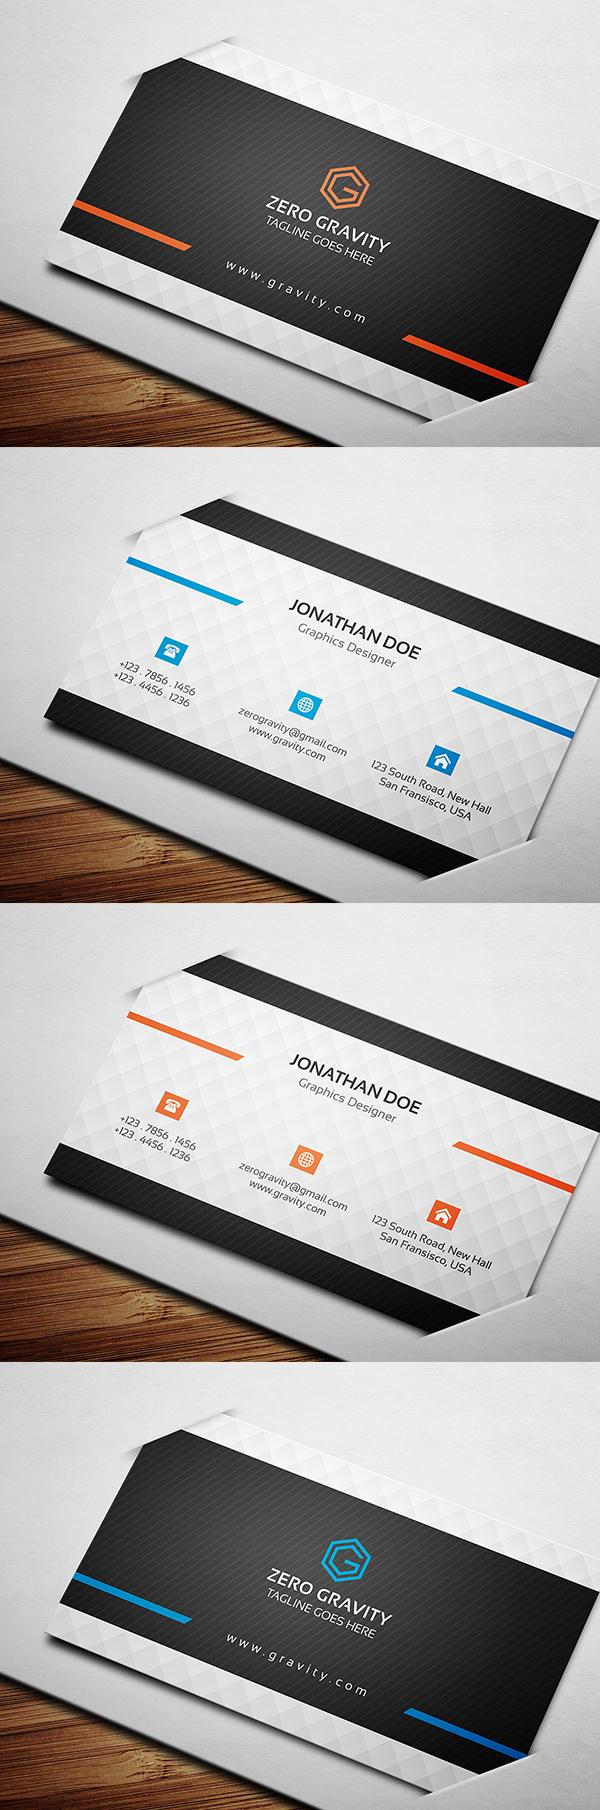 03 Business Card Design